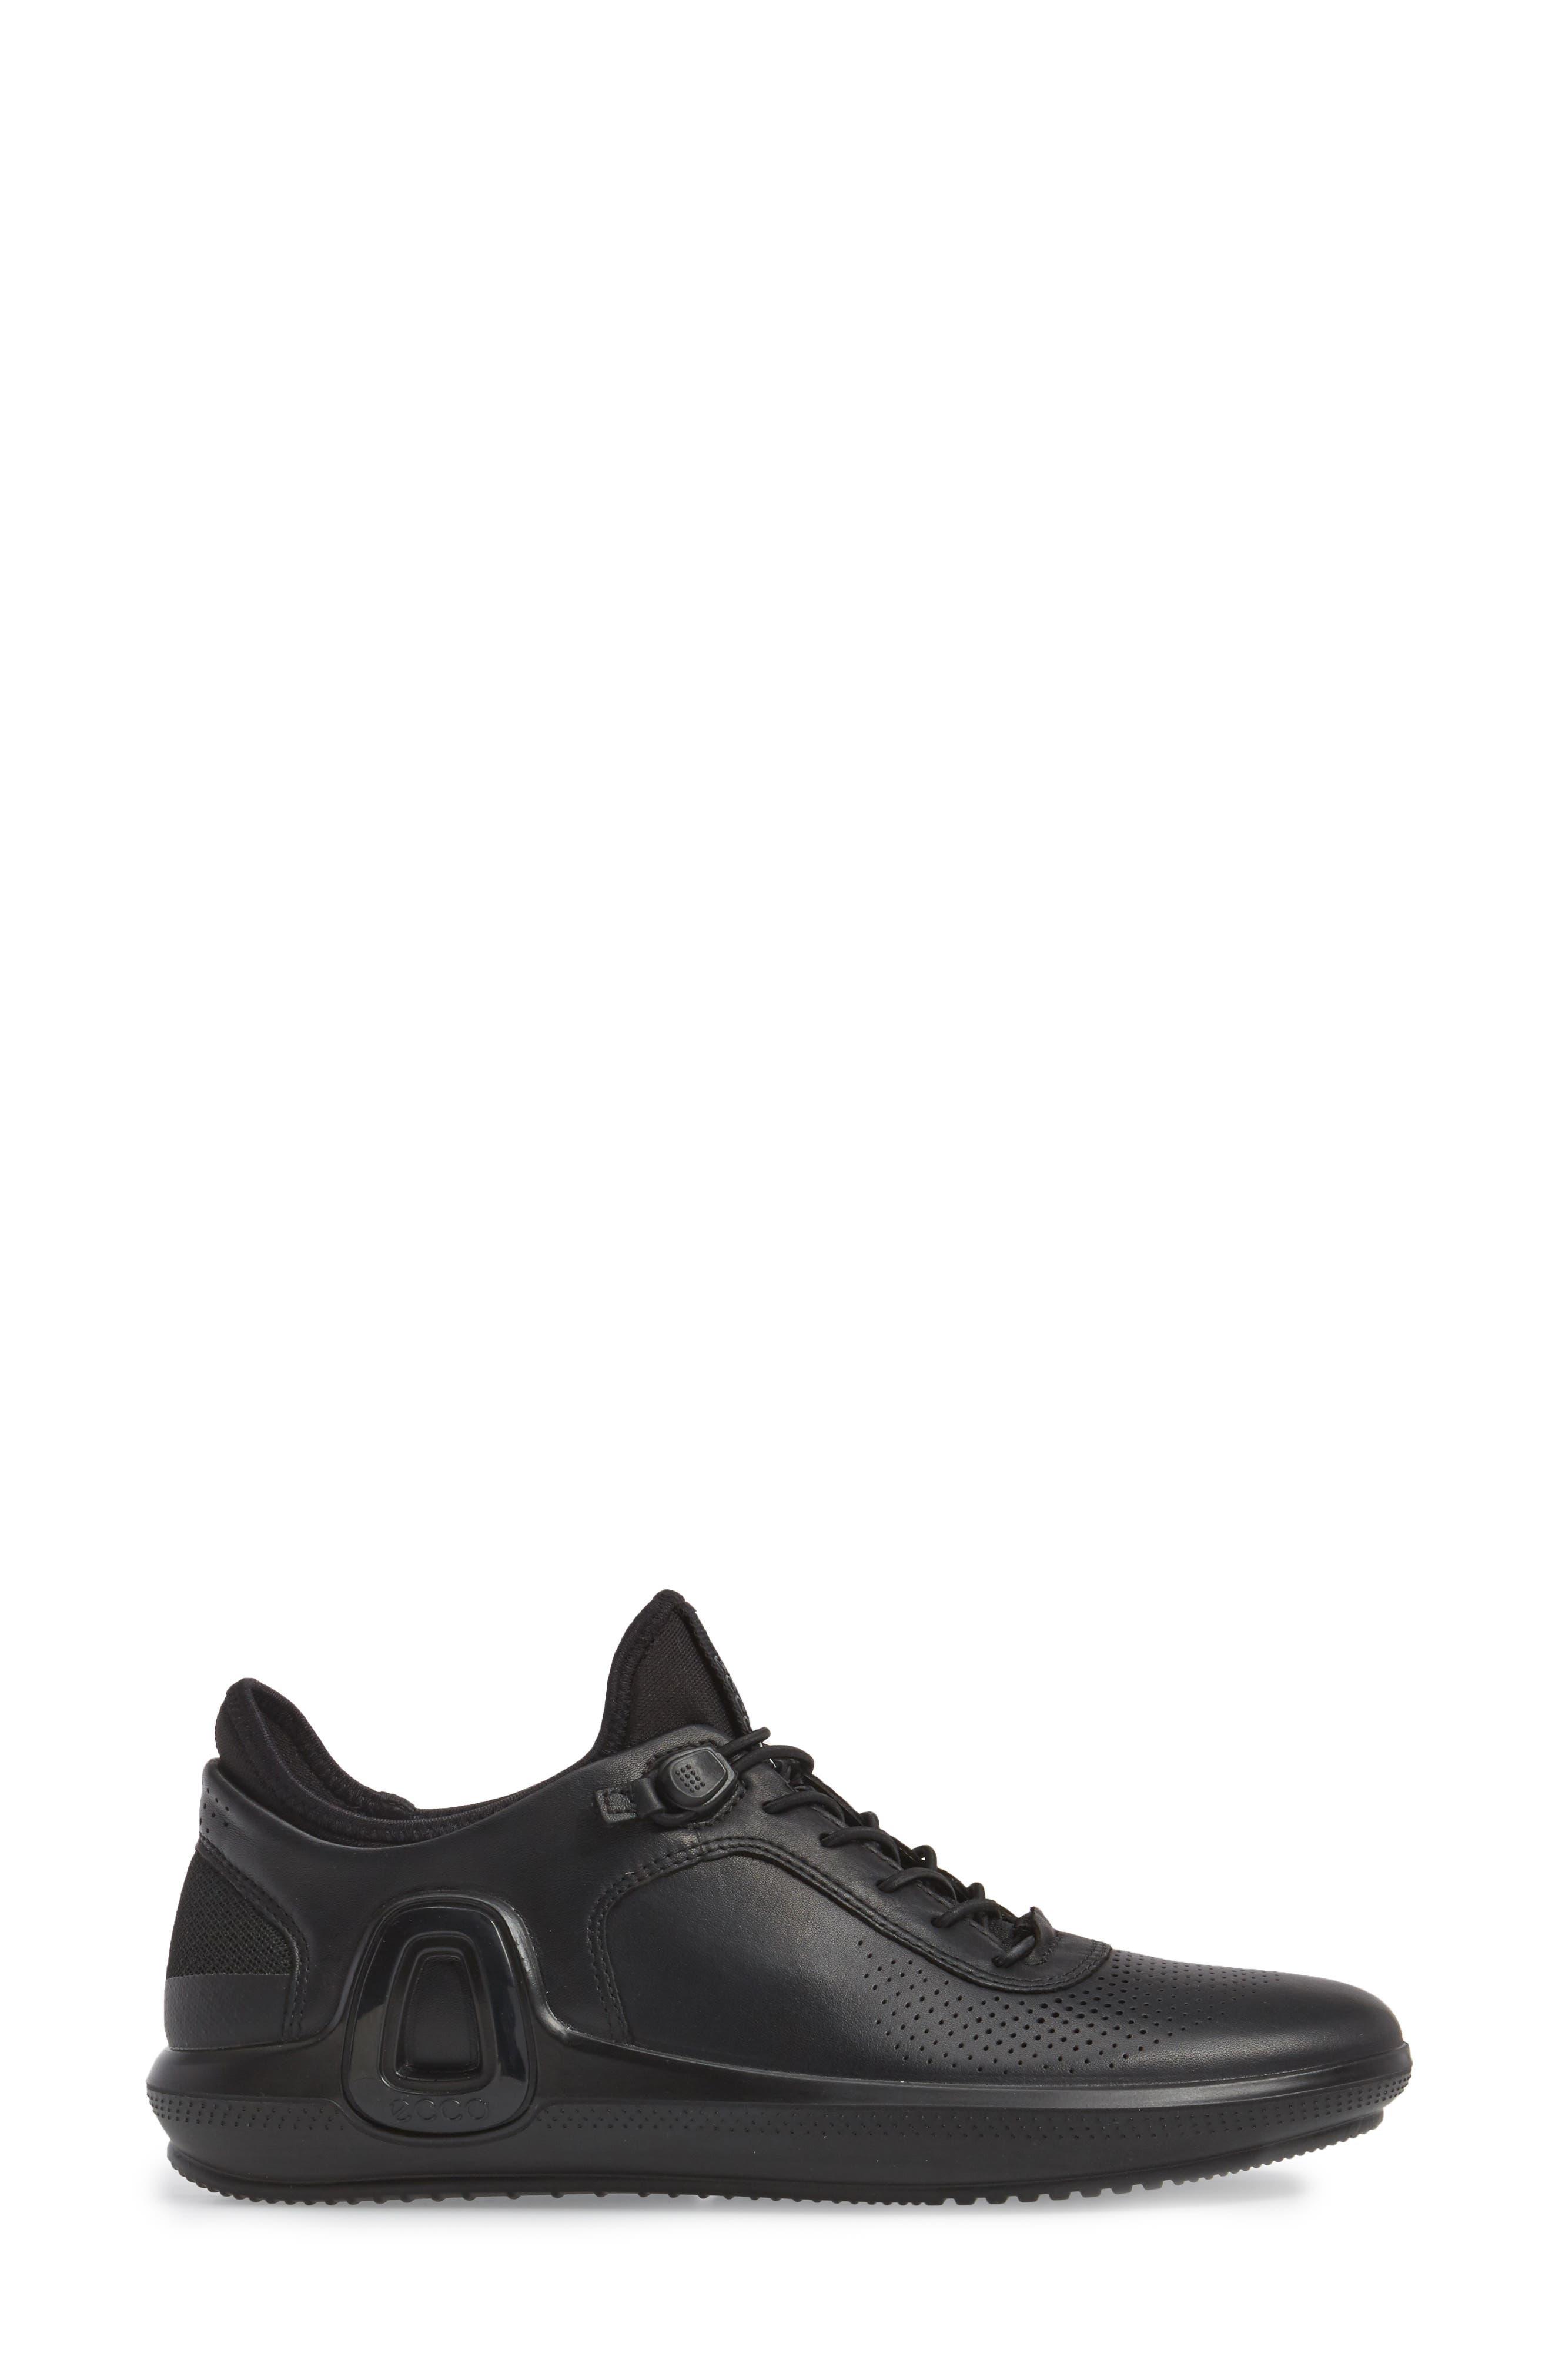 Alternate Image 3  - ECCO Intrinsic 3 Sneaker (Women)